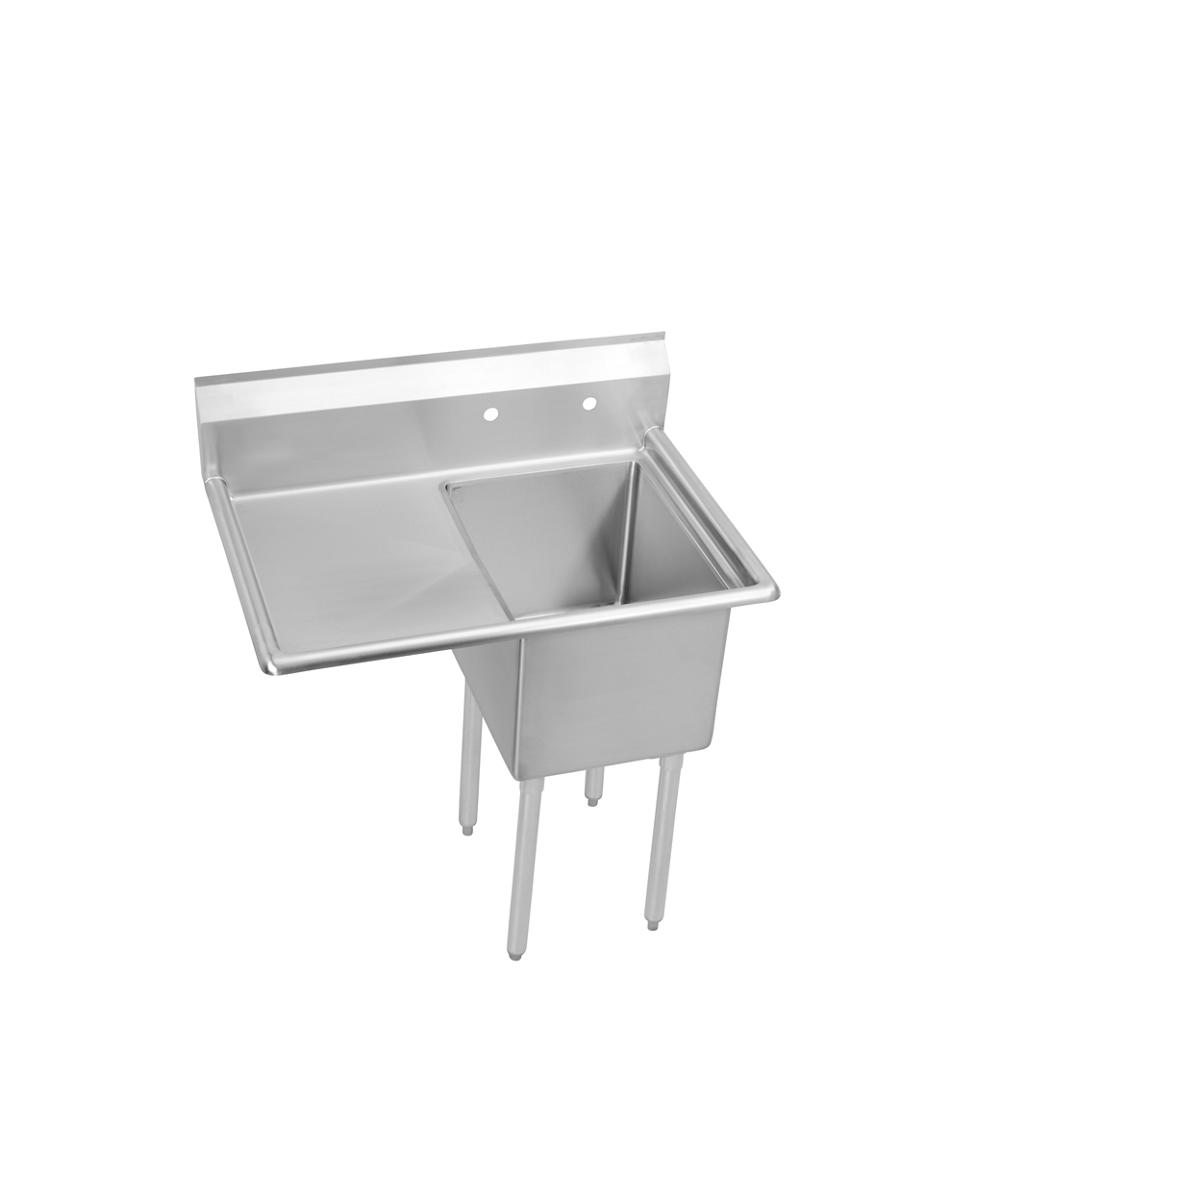 "Elkay 1 Compartment Sink, 51x30 Oa, 24x24 Bowl, 12 Deep, Left 24"" Dbs, Stainless Steel Legs, 18 Ga 300 Series Stainless Steel, Nsf"